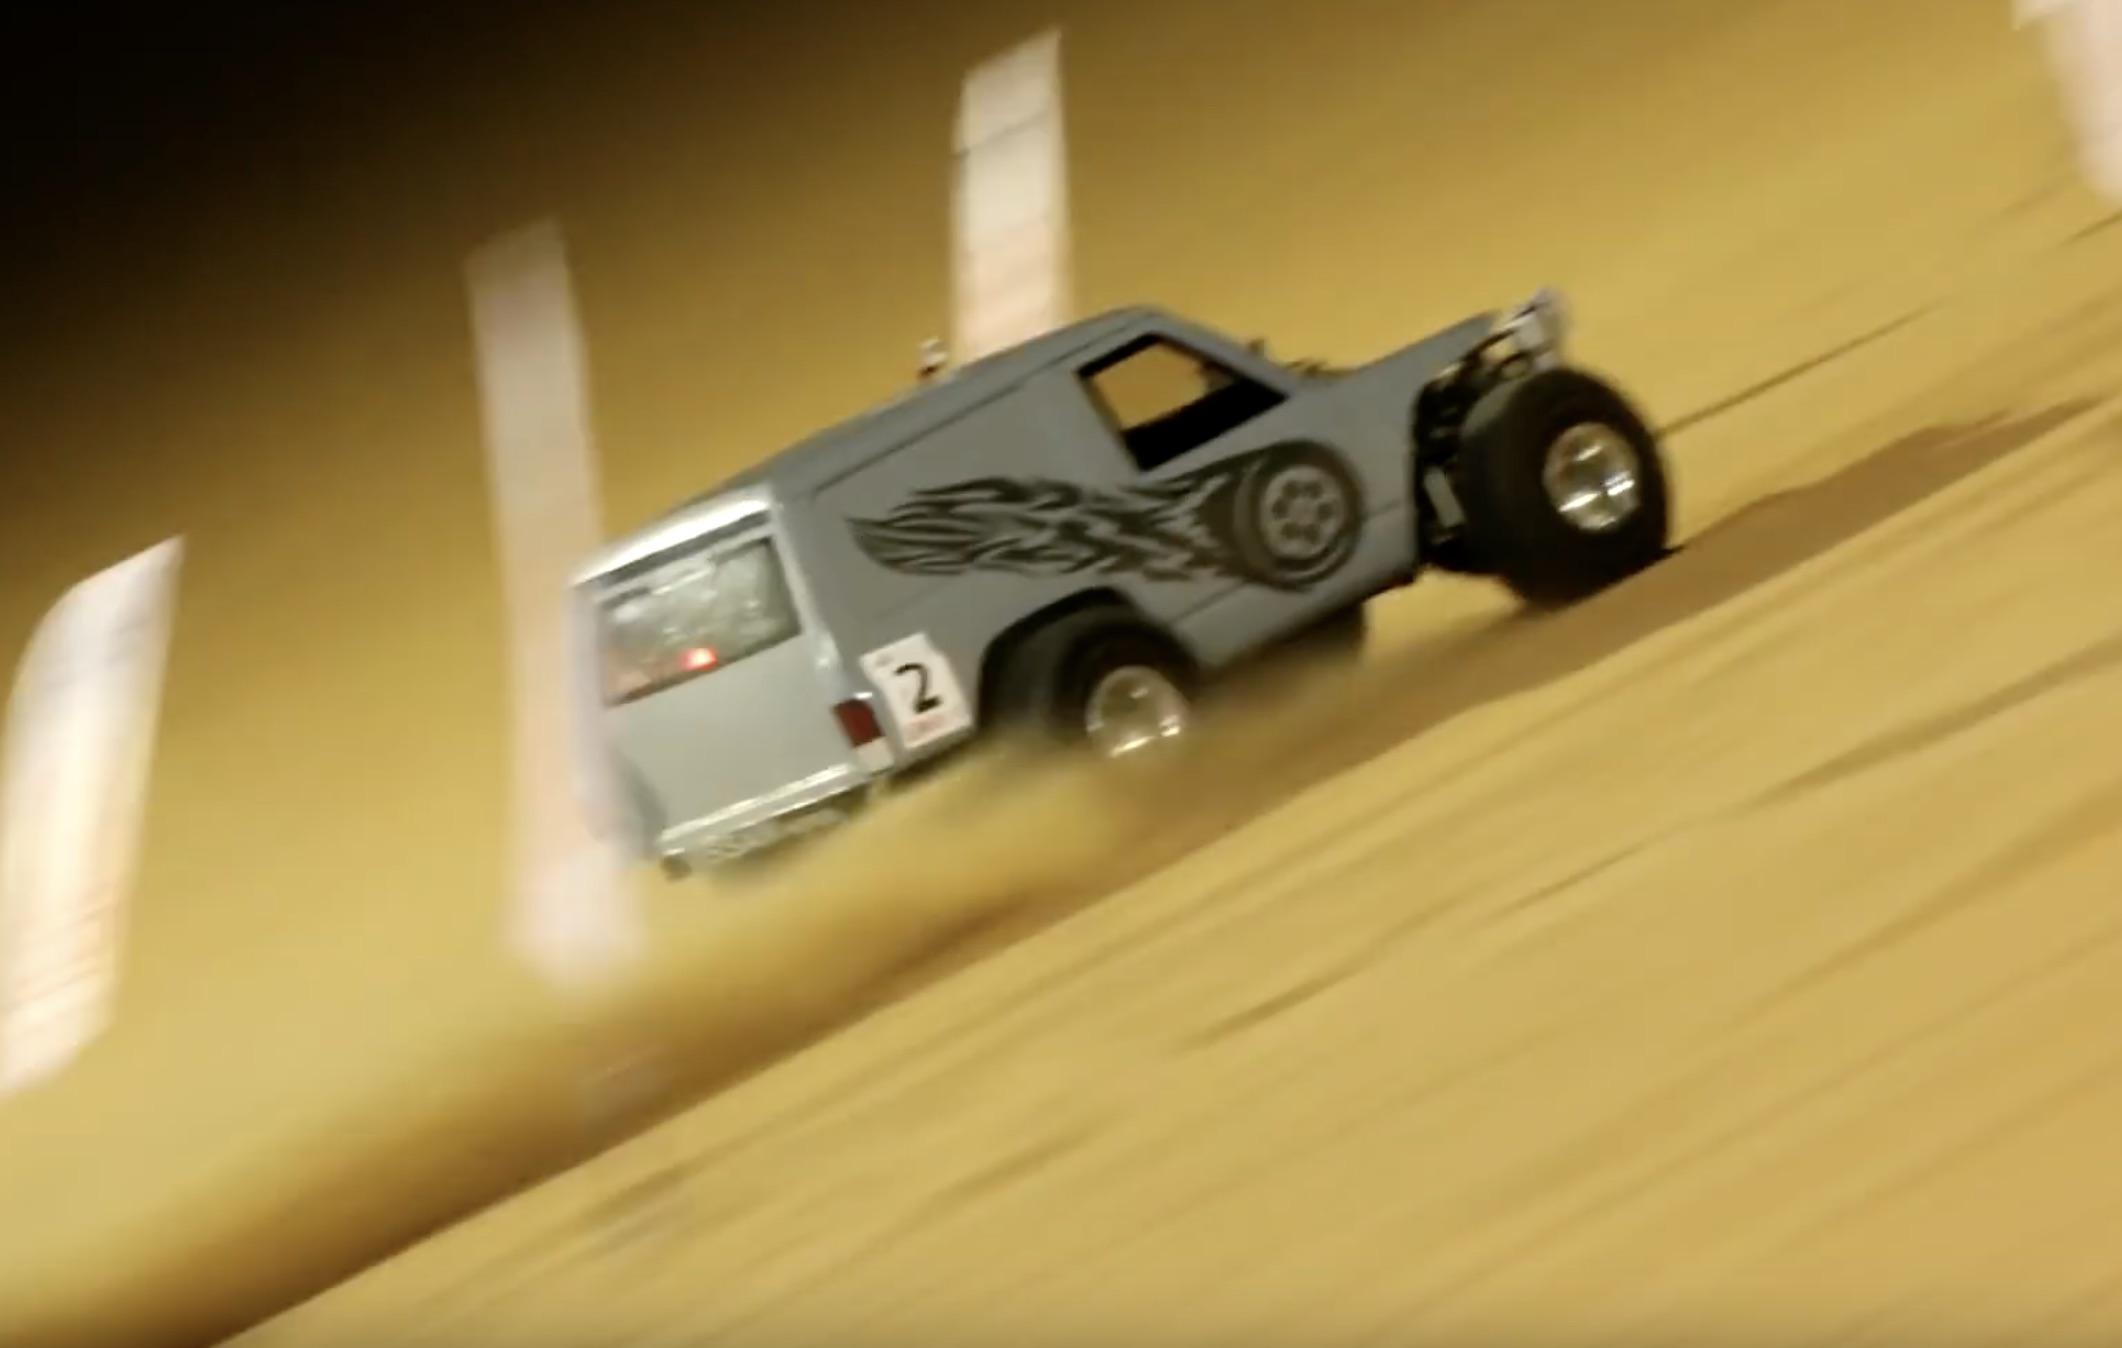 Morning Symphony: The Liwa Sand Dune Hillclimb In The UAE